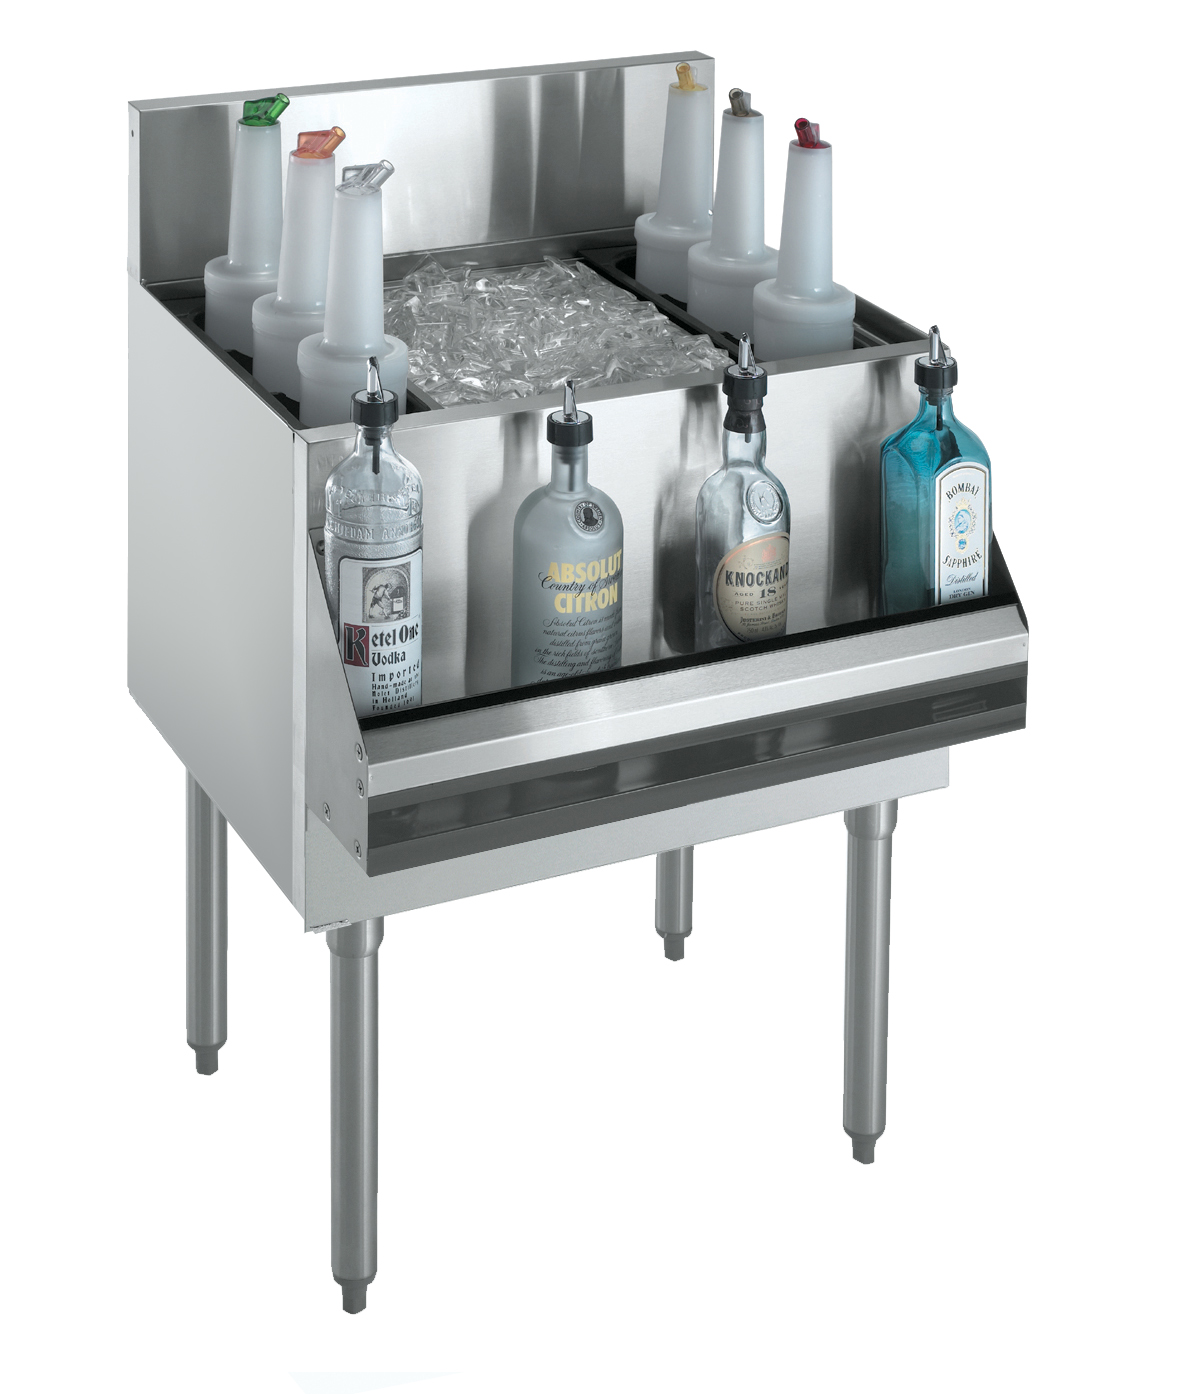 Krowne Metal KR18-24-10 underbar ice bin/cocktail unit